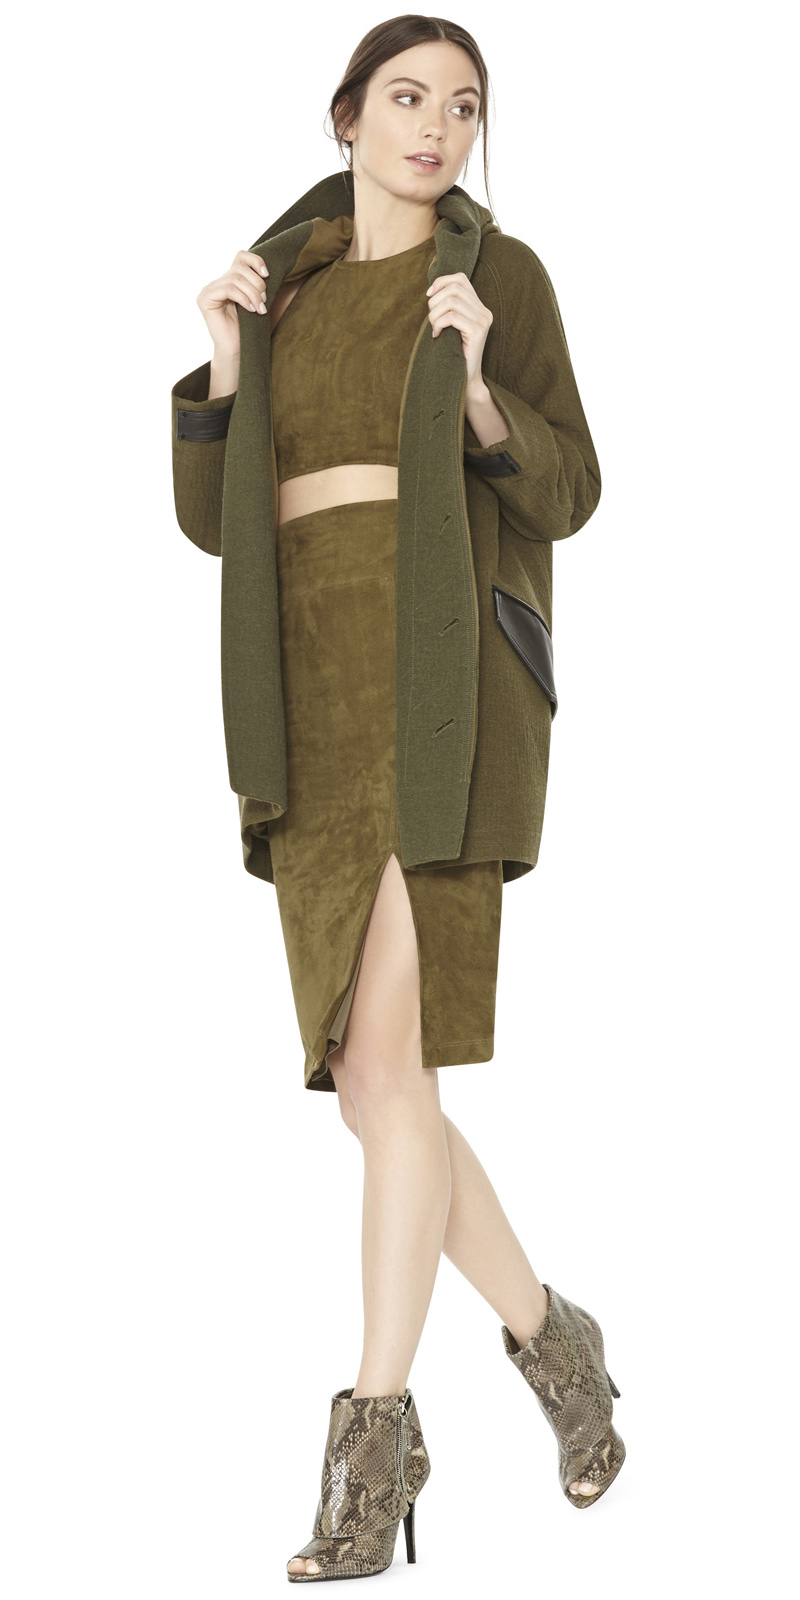 green-olive-pencil-skirt-green-olive-crop-top-matchset-hairr-bun-green-olive-jacket-coat-fall-winter-dinner.jpeg